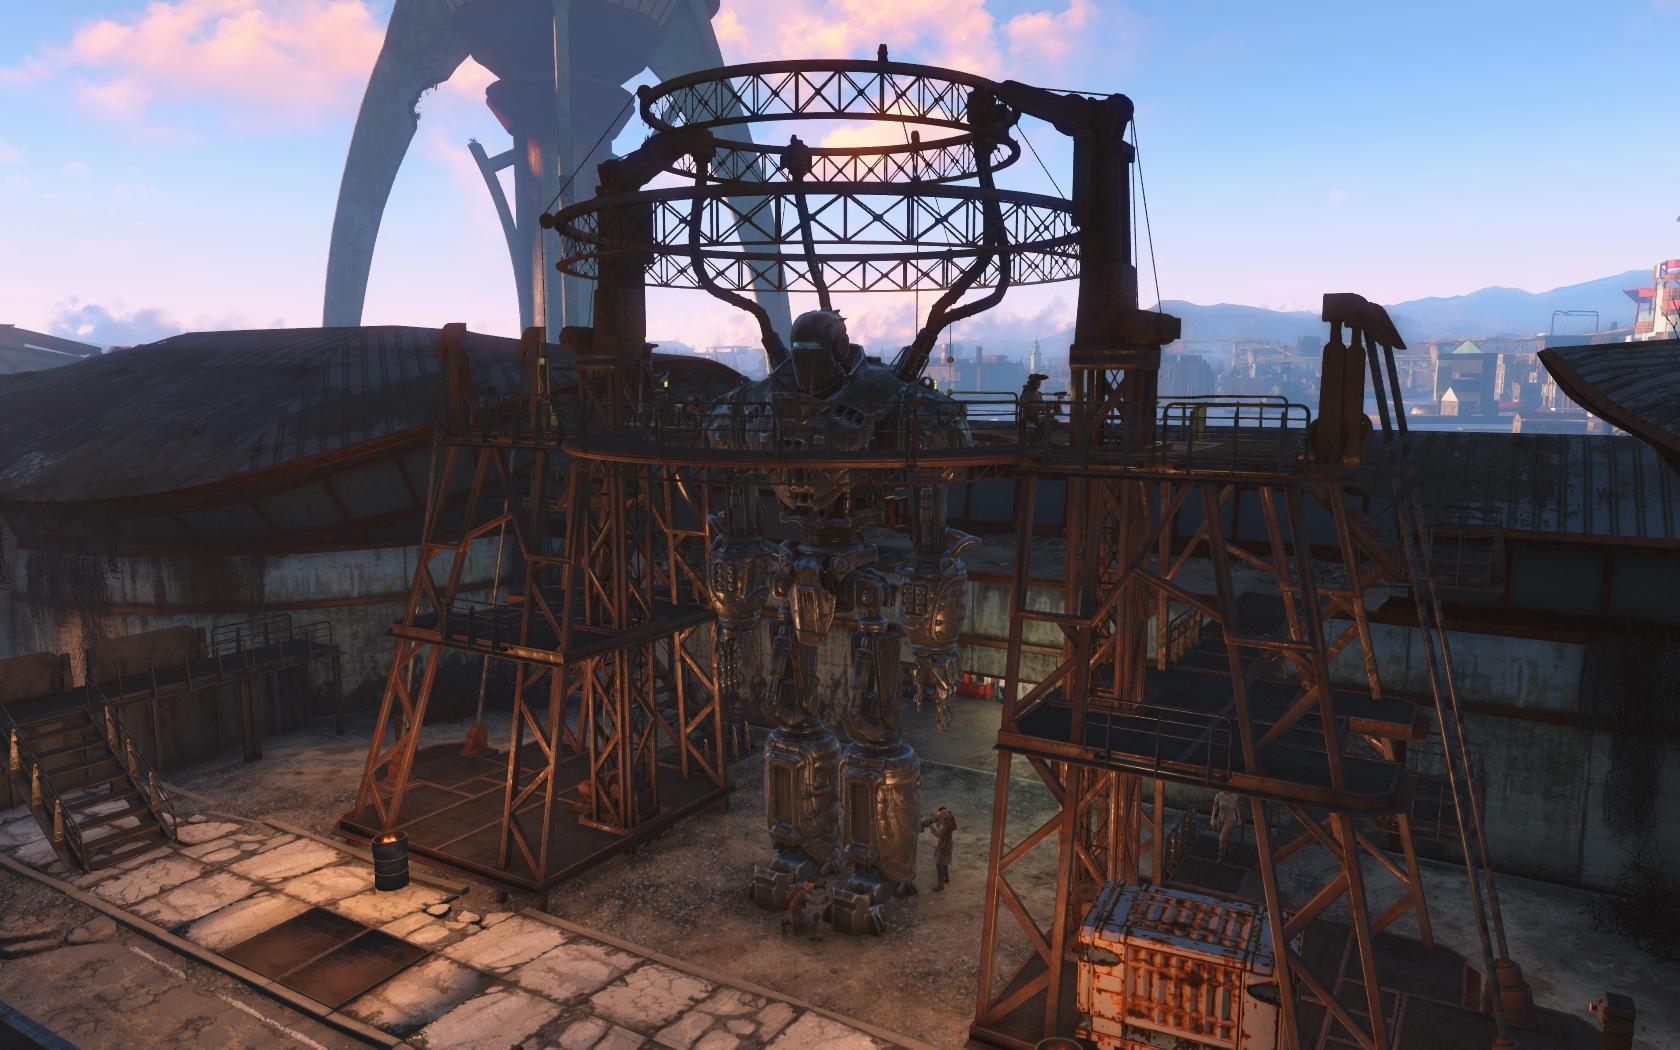 Либерти Прайм - Fallout 4 Братство, Братство Стали, Либерти Прайм